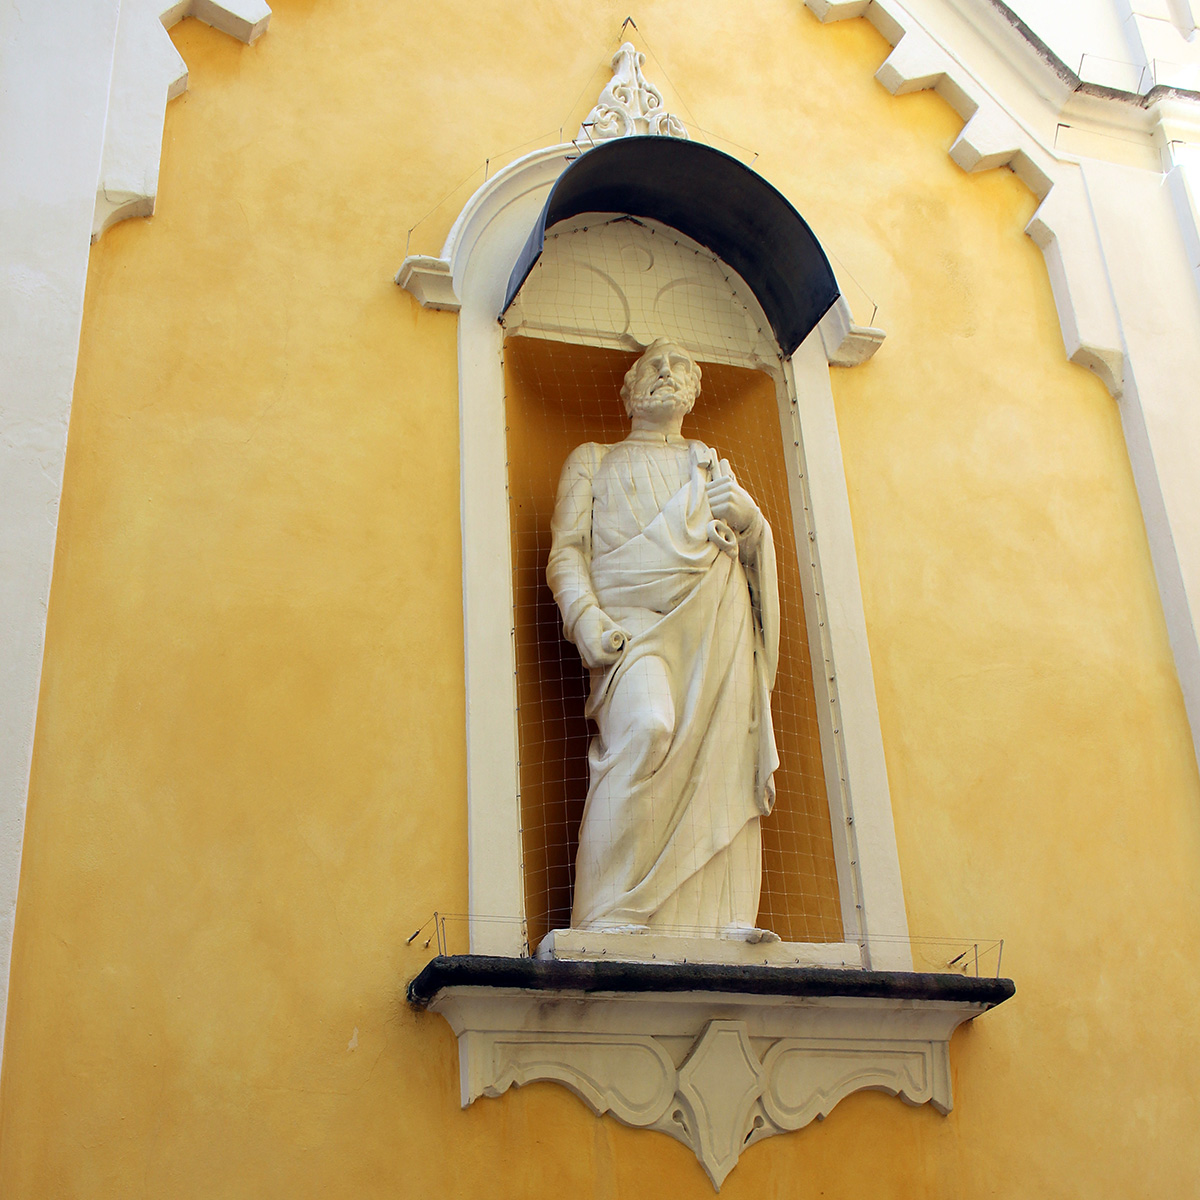 Ascona sculpture d'un Saint